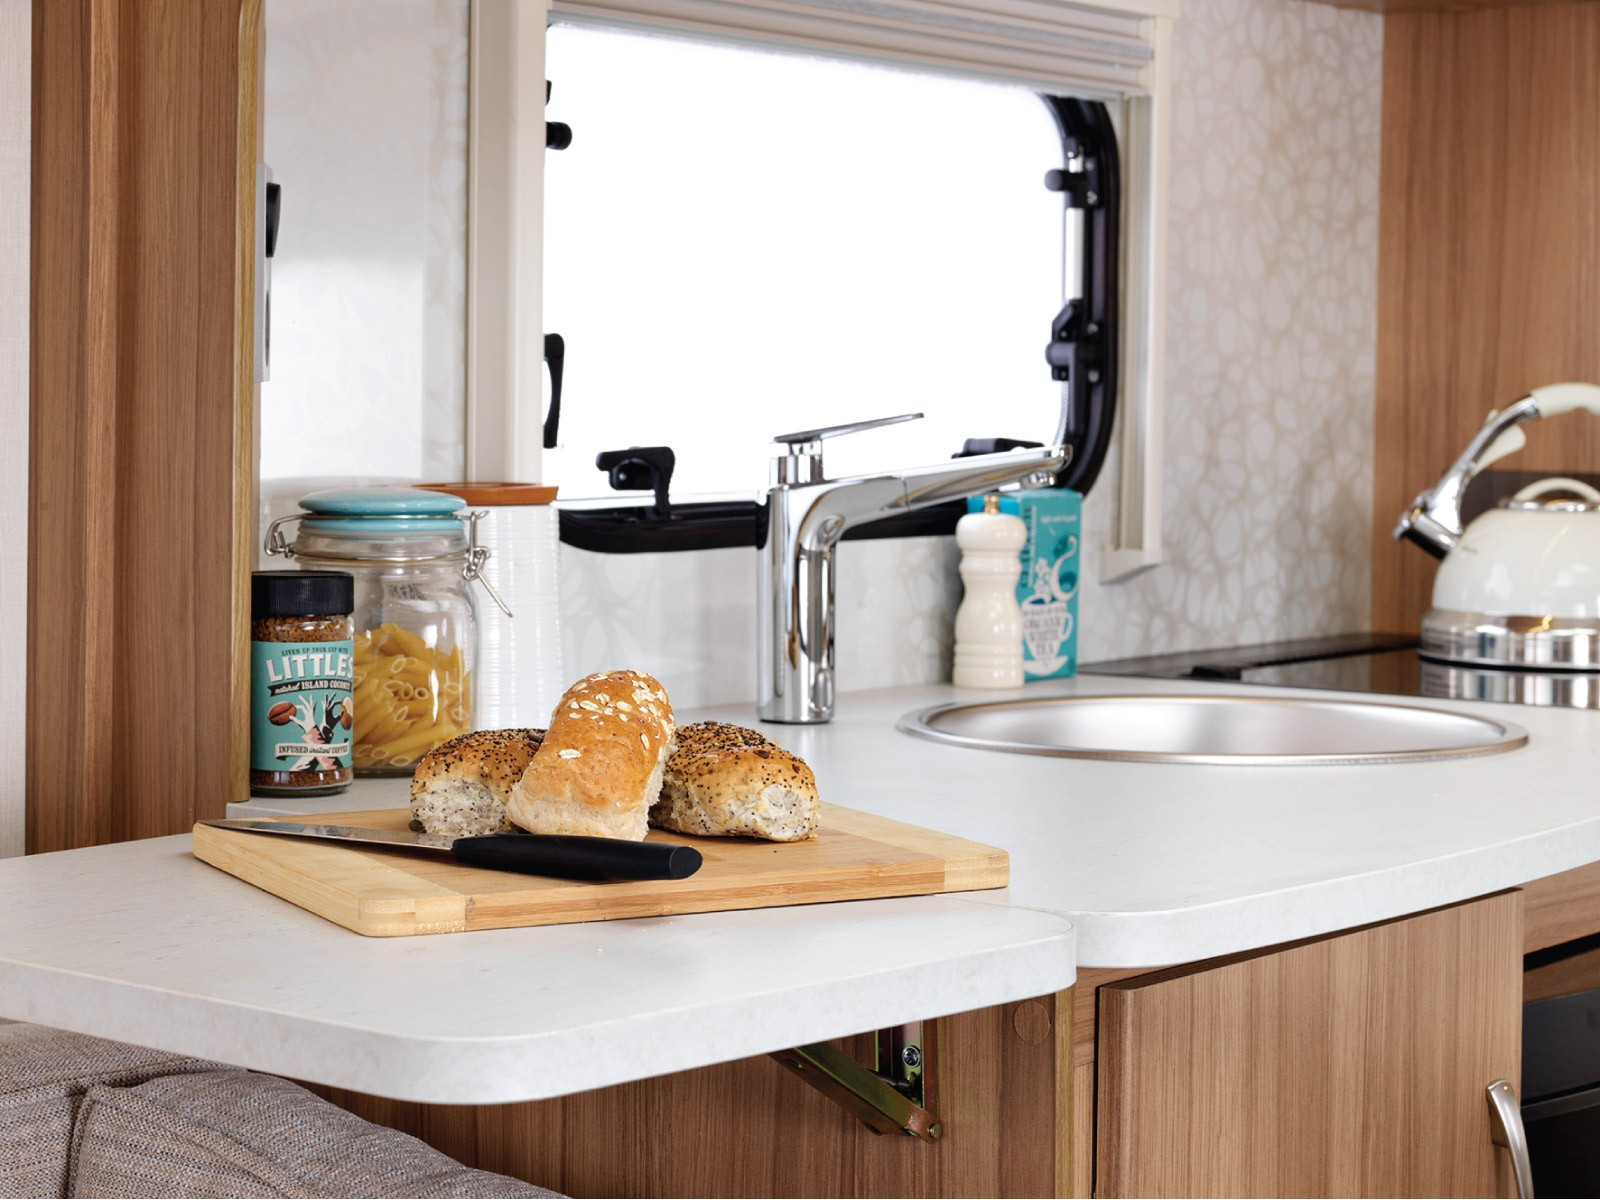 Lunar Caravans Internal Kitchen Extension Sink Image